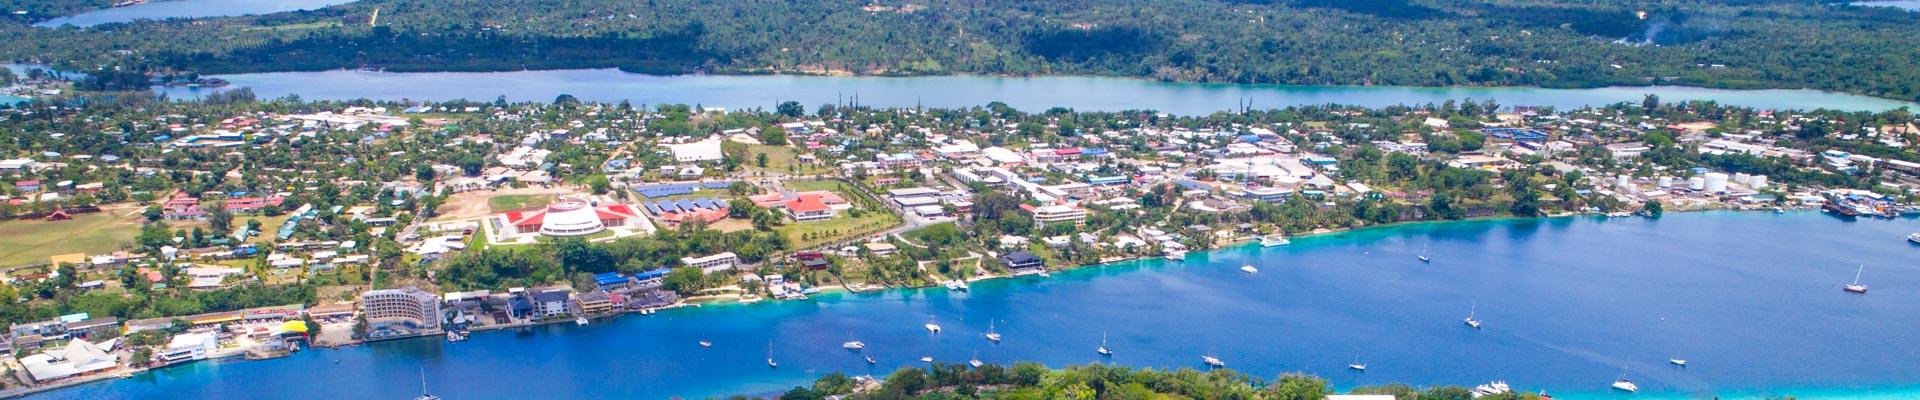 Port Vila and Efate